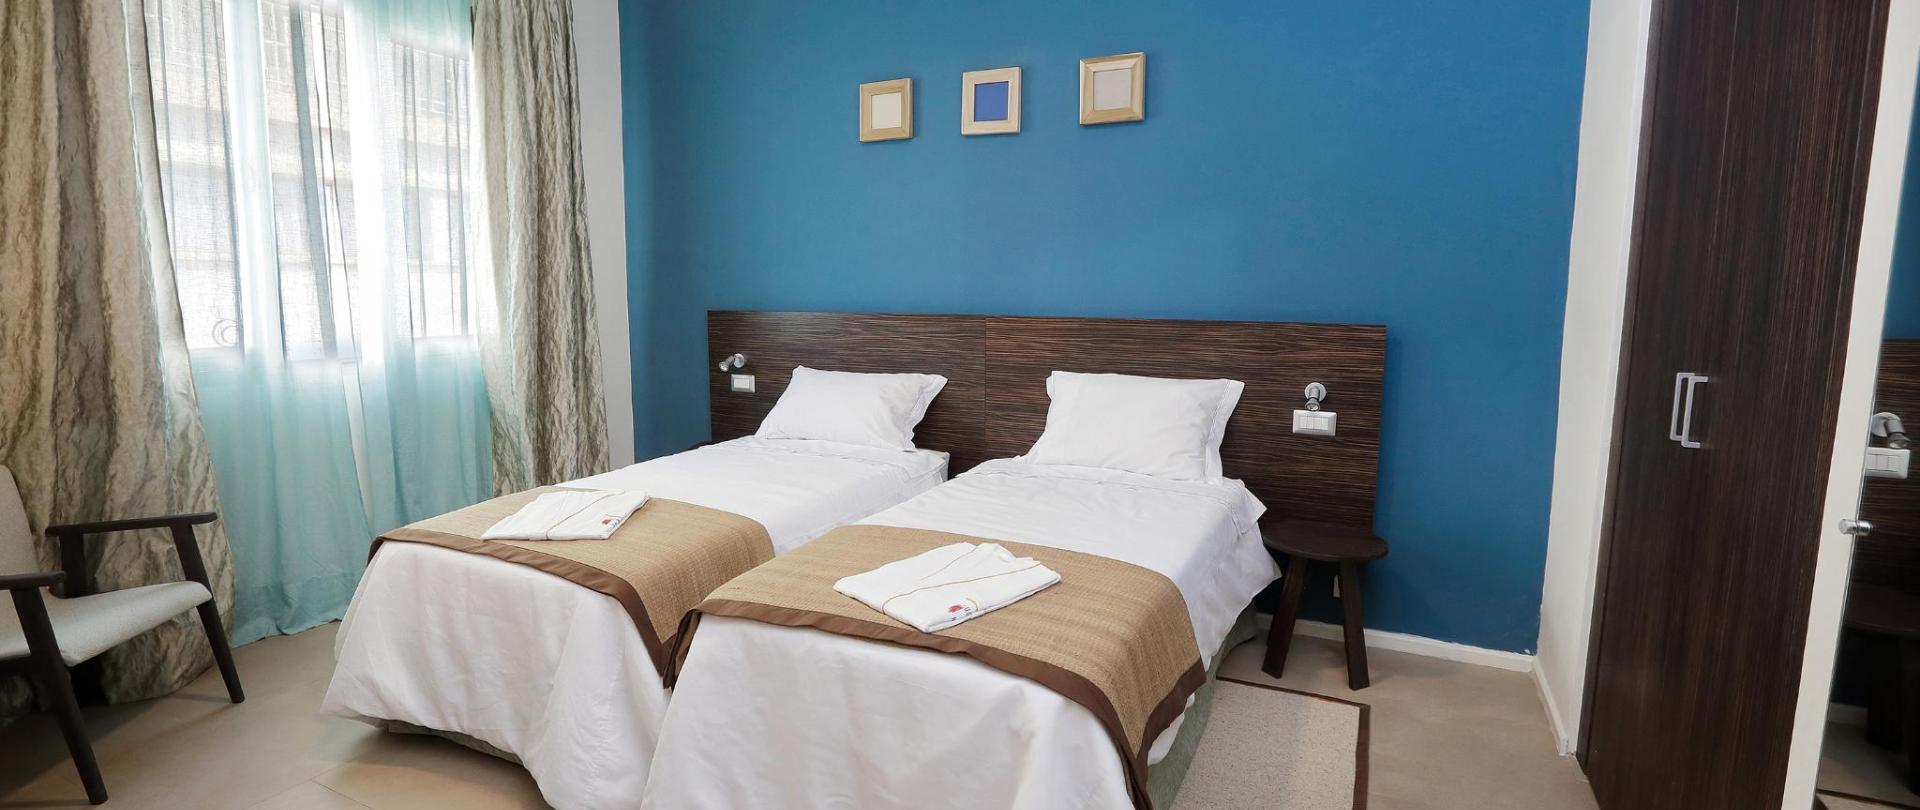 0005_Hotel La Villette Isoraka_17-10-13.jpg